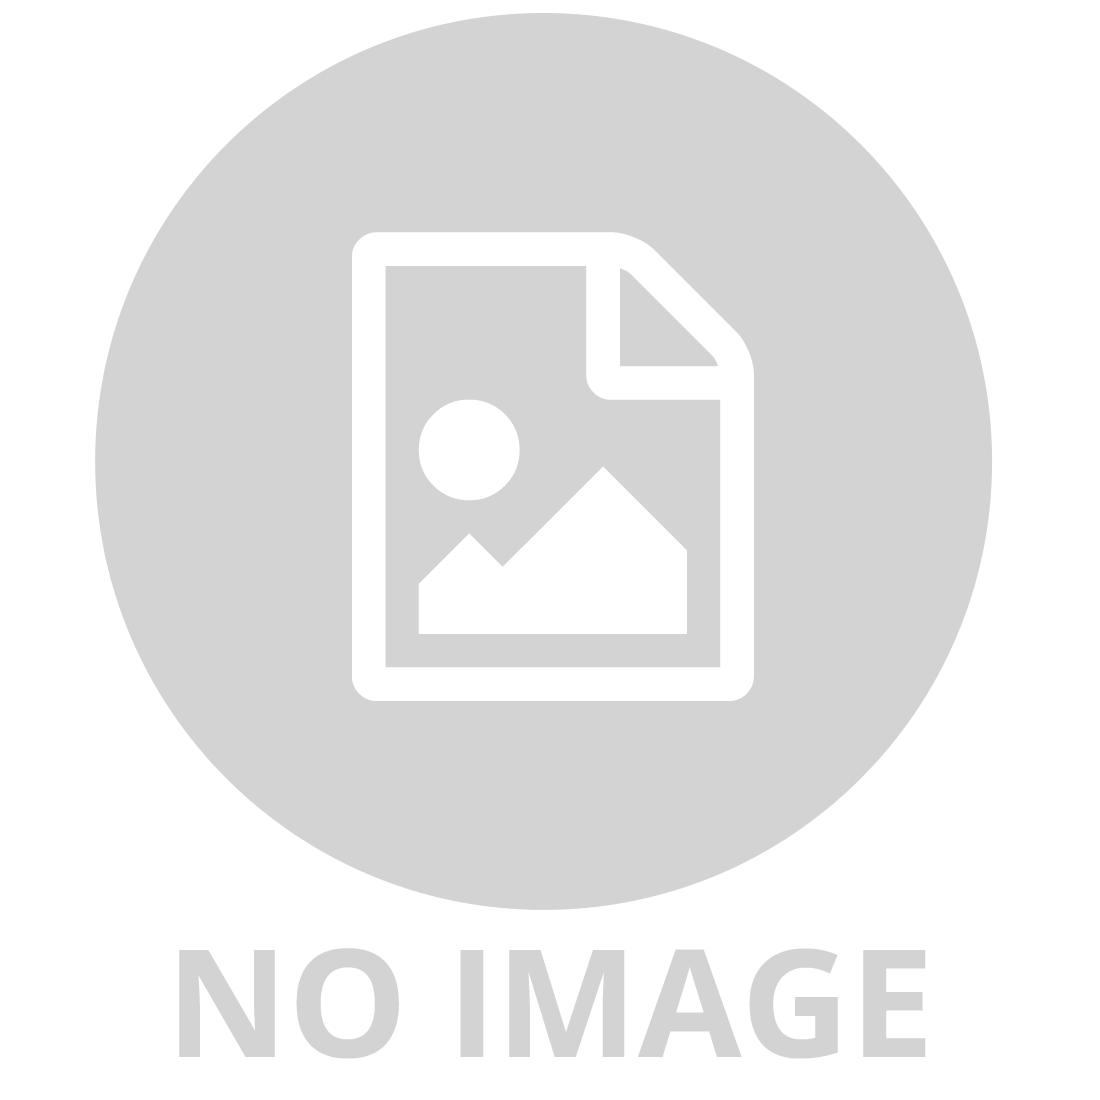 SCALEXTRIC VW BEETLE RUSTY YELLOW